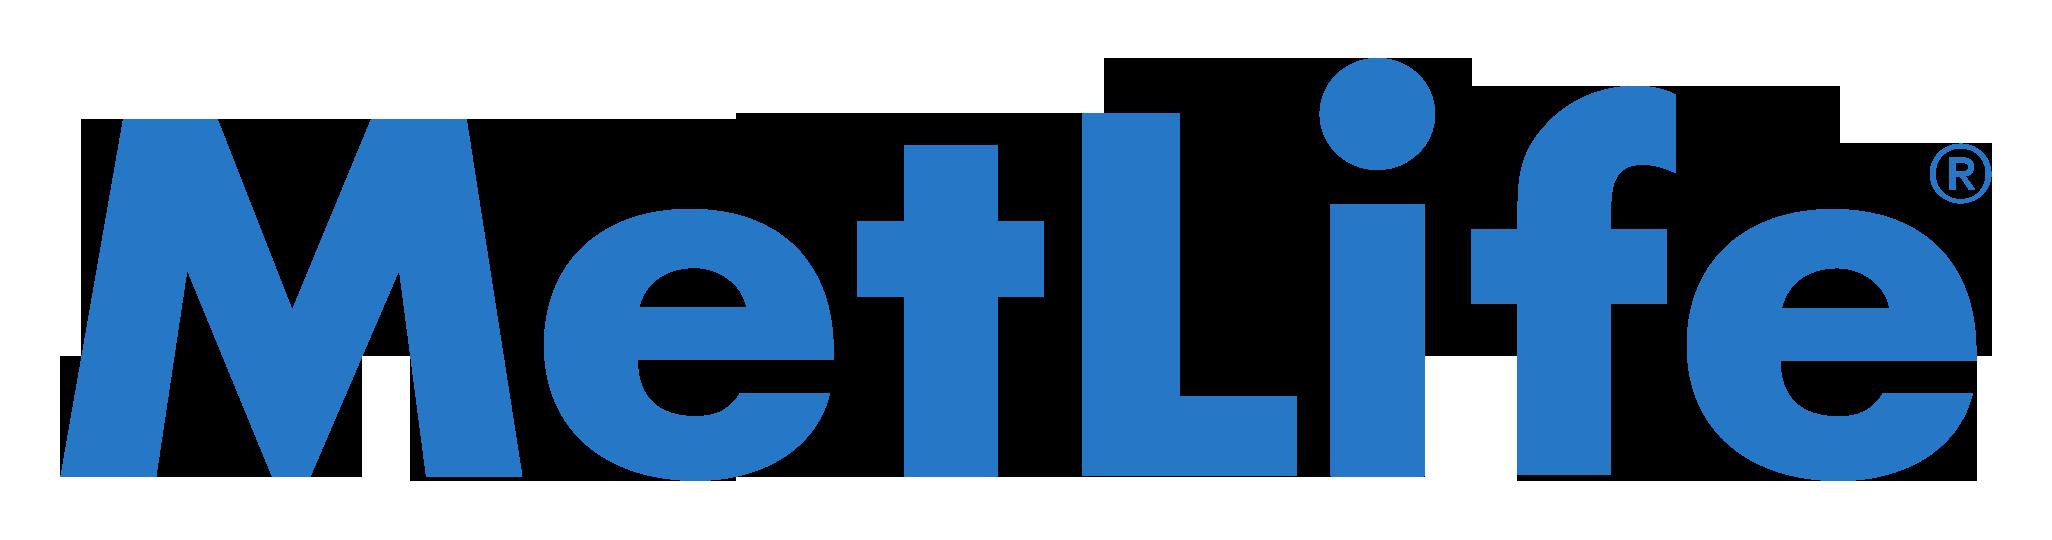 kisspng-metlife-dental-insurance-company-finance-metlife-logo-5a73f01455efb4.413271771517547540352